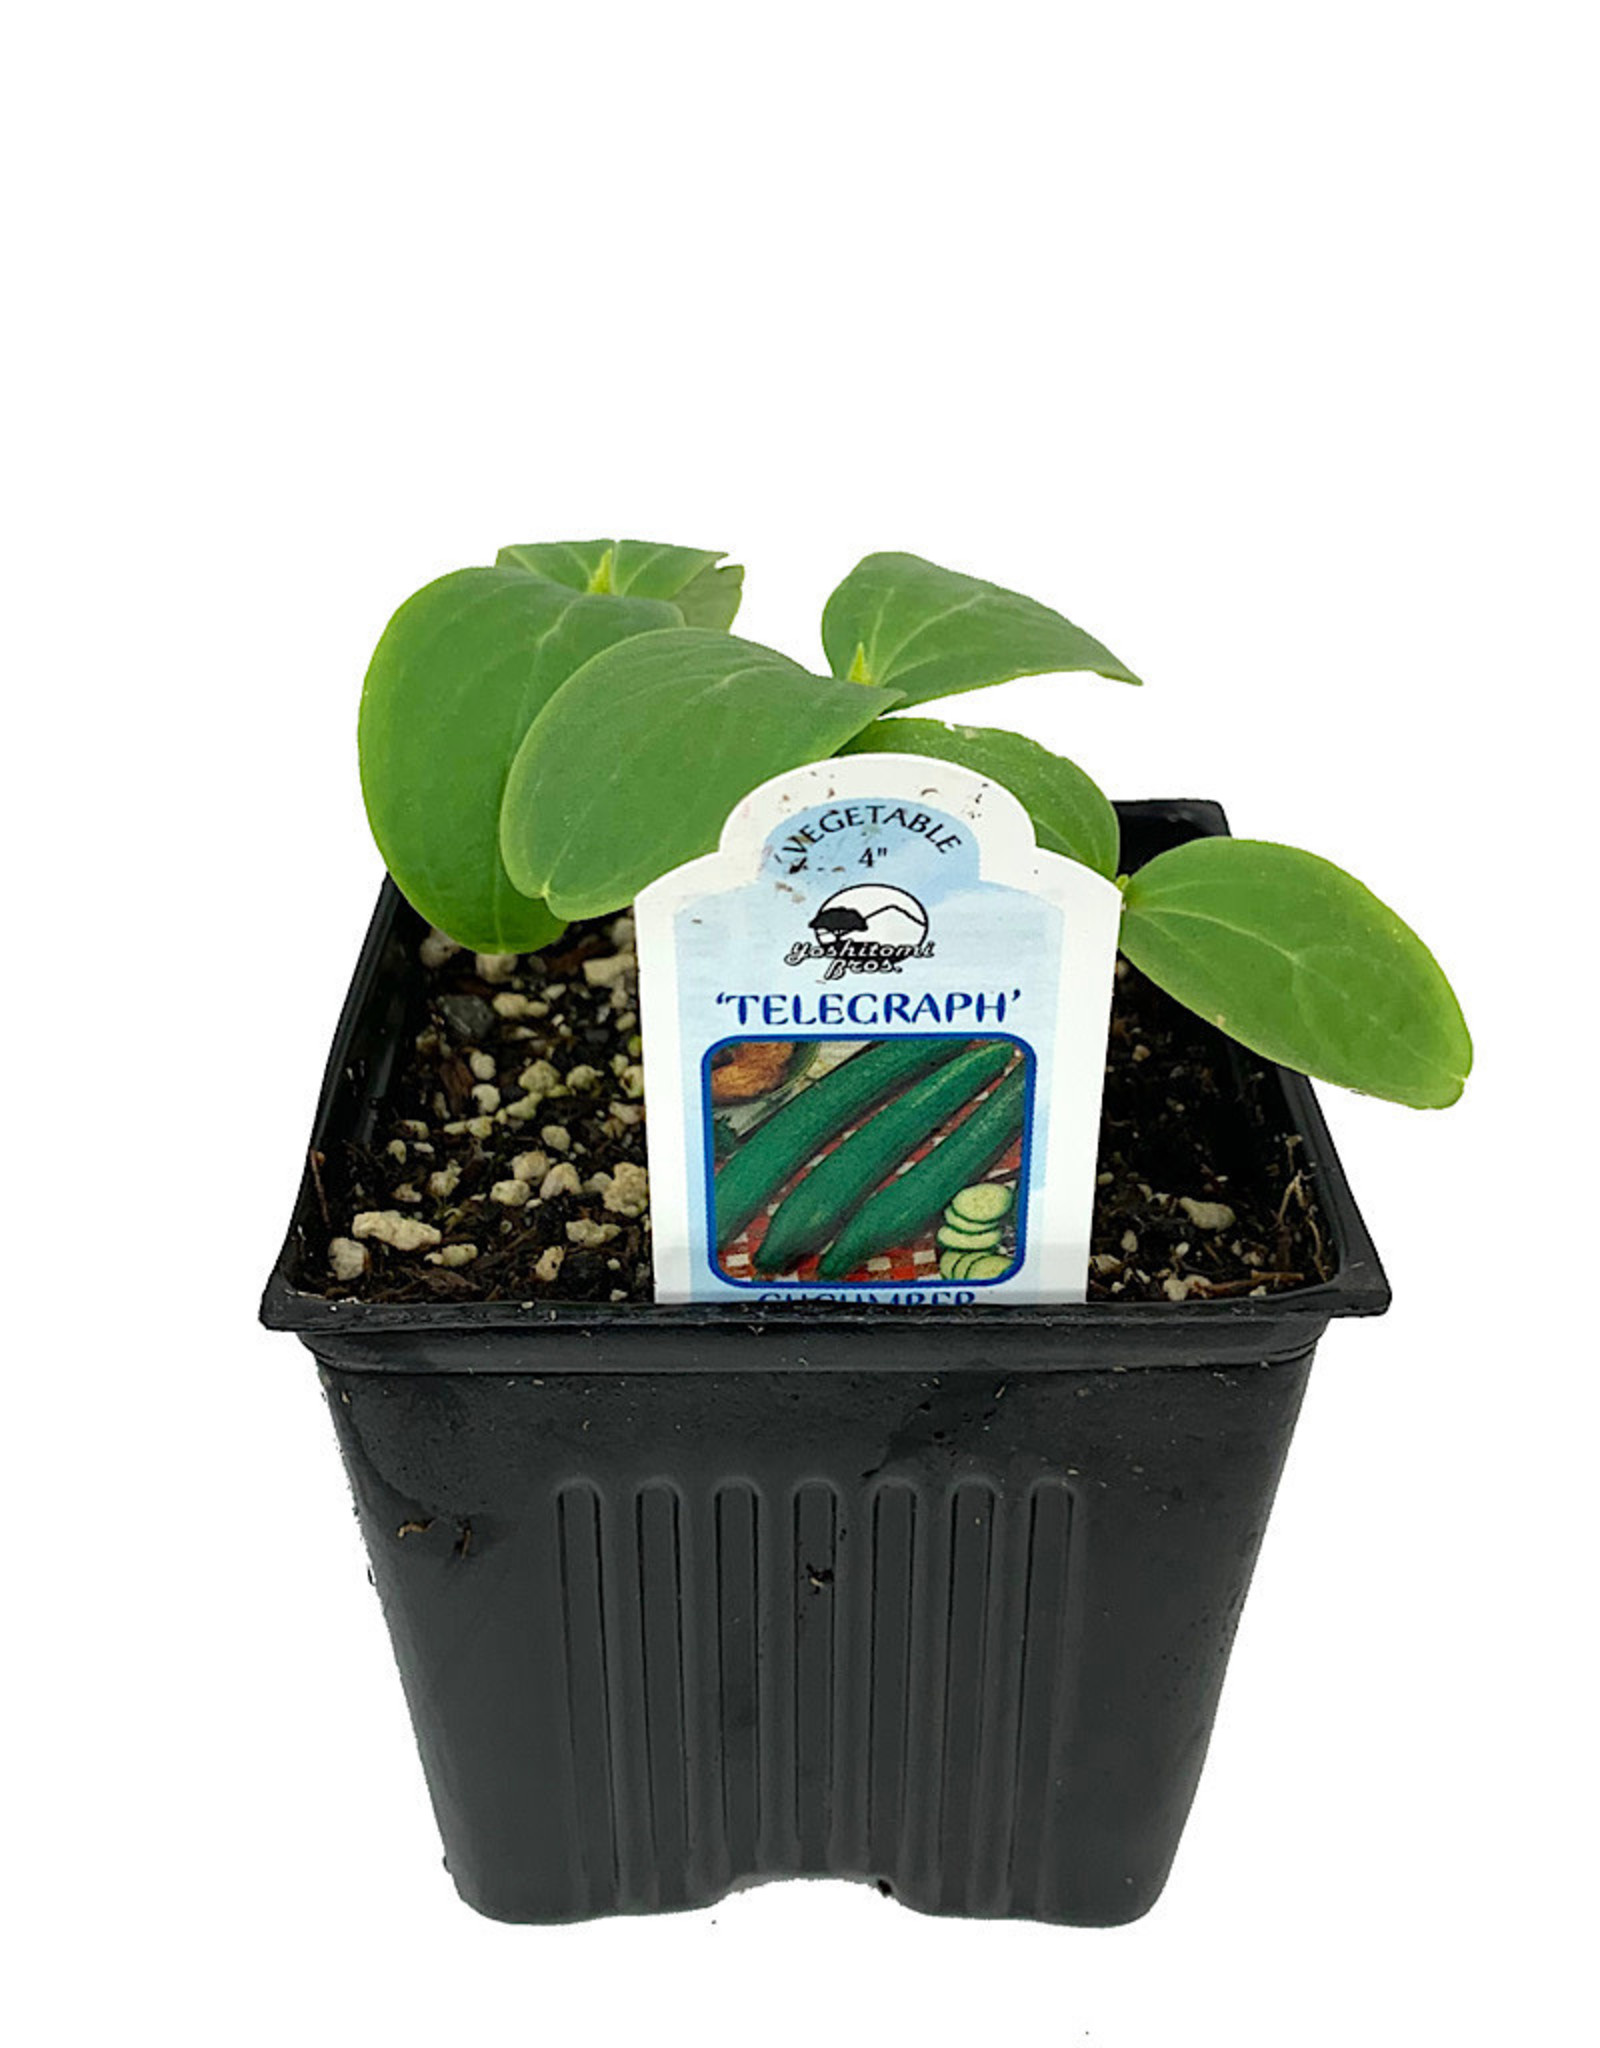 Cucumber 'Telegraph English' - 4 inch